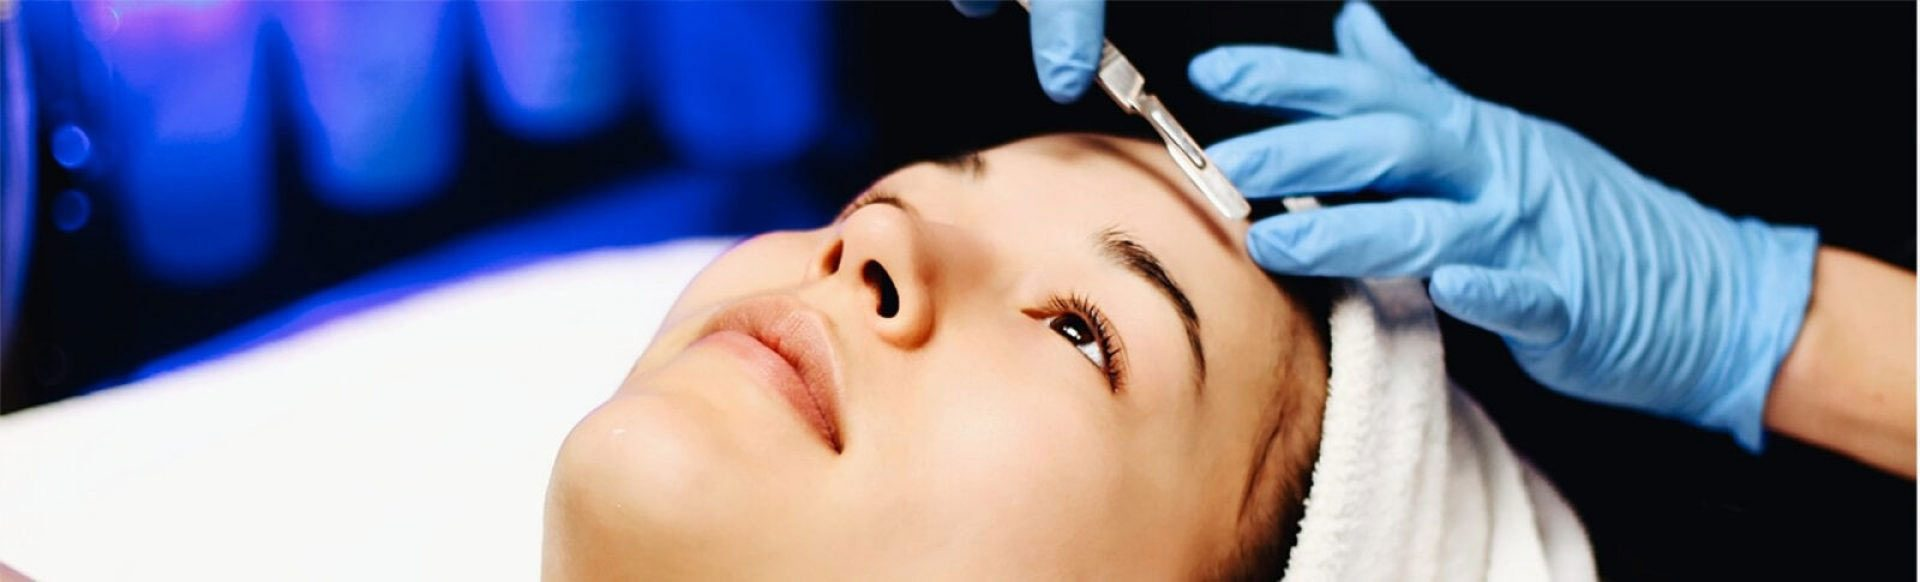 Innovative-Aesthetics-medical-spa-Services-Dermaplaning